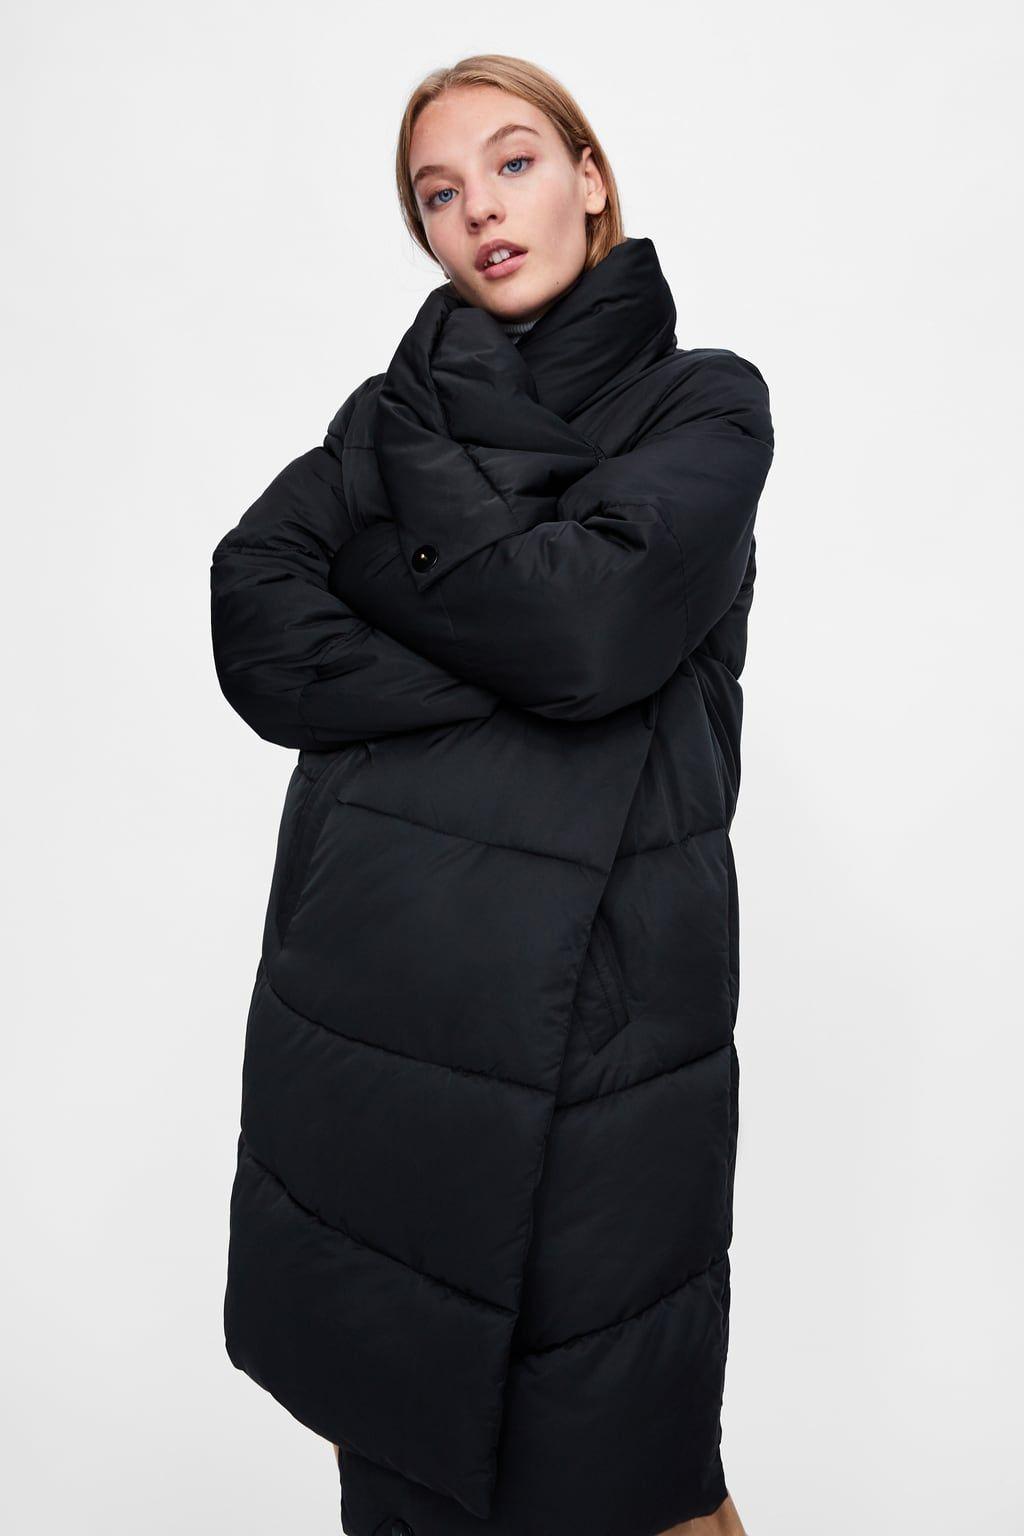 Puffer Coat With Wrap Collar From Zara Puffer Coat Quilted Coat Coat [ 1536 x 1024 Pixel ]